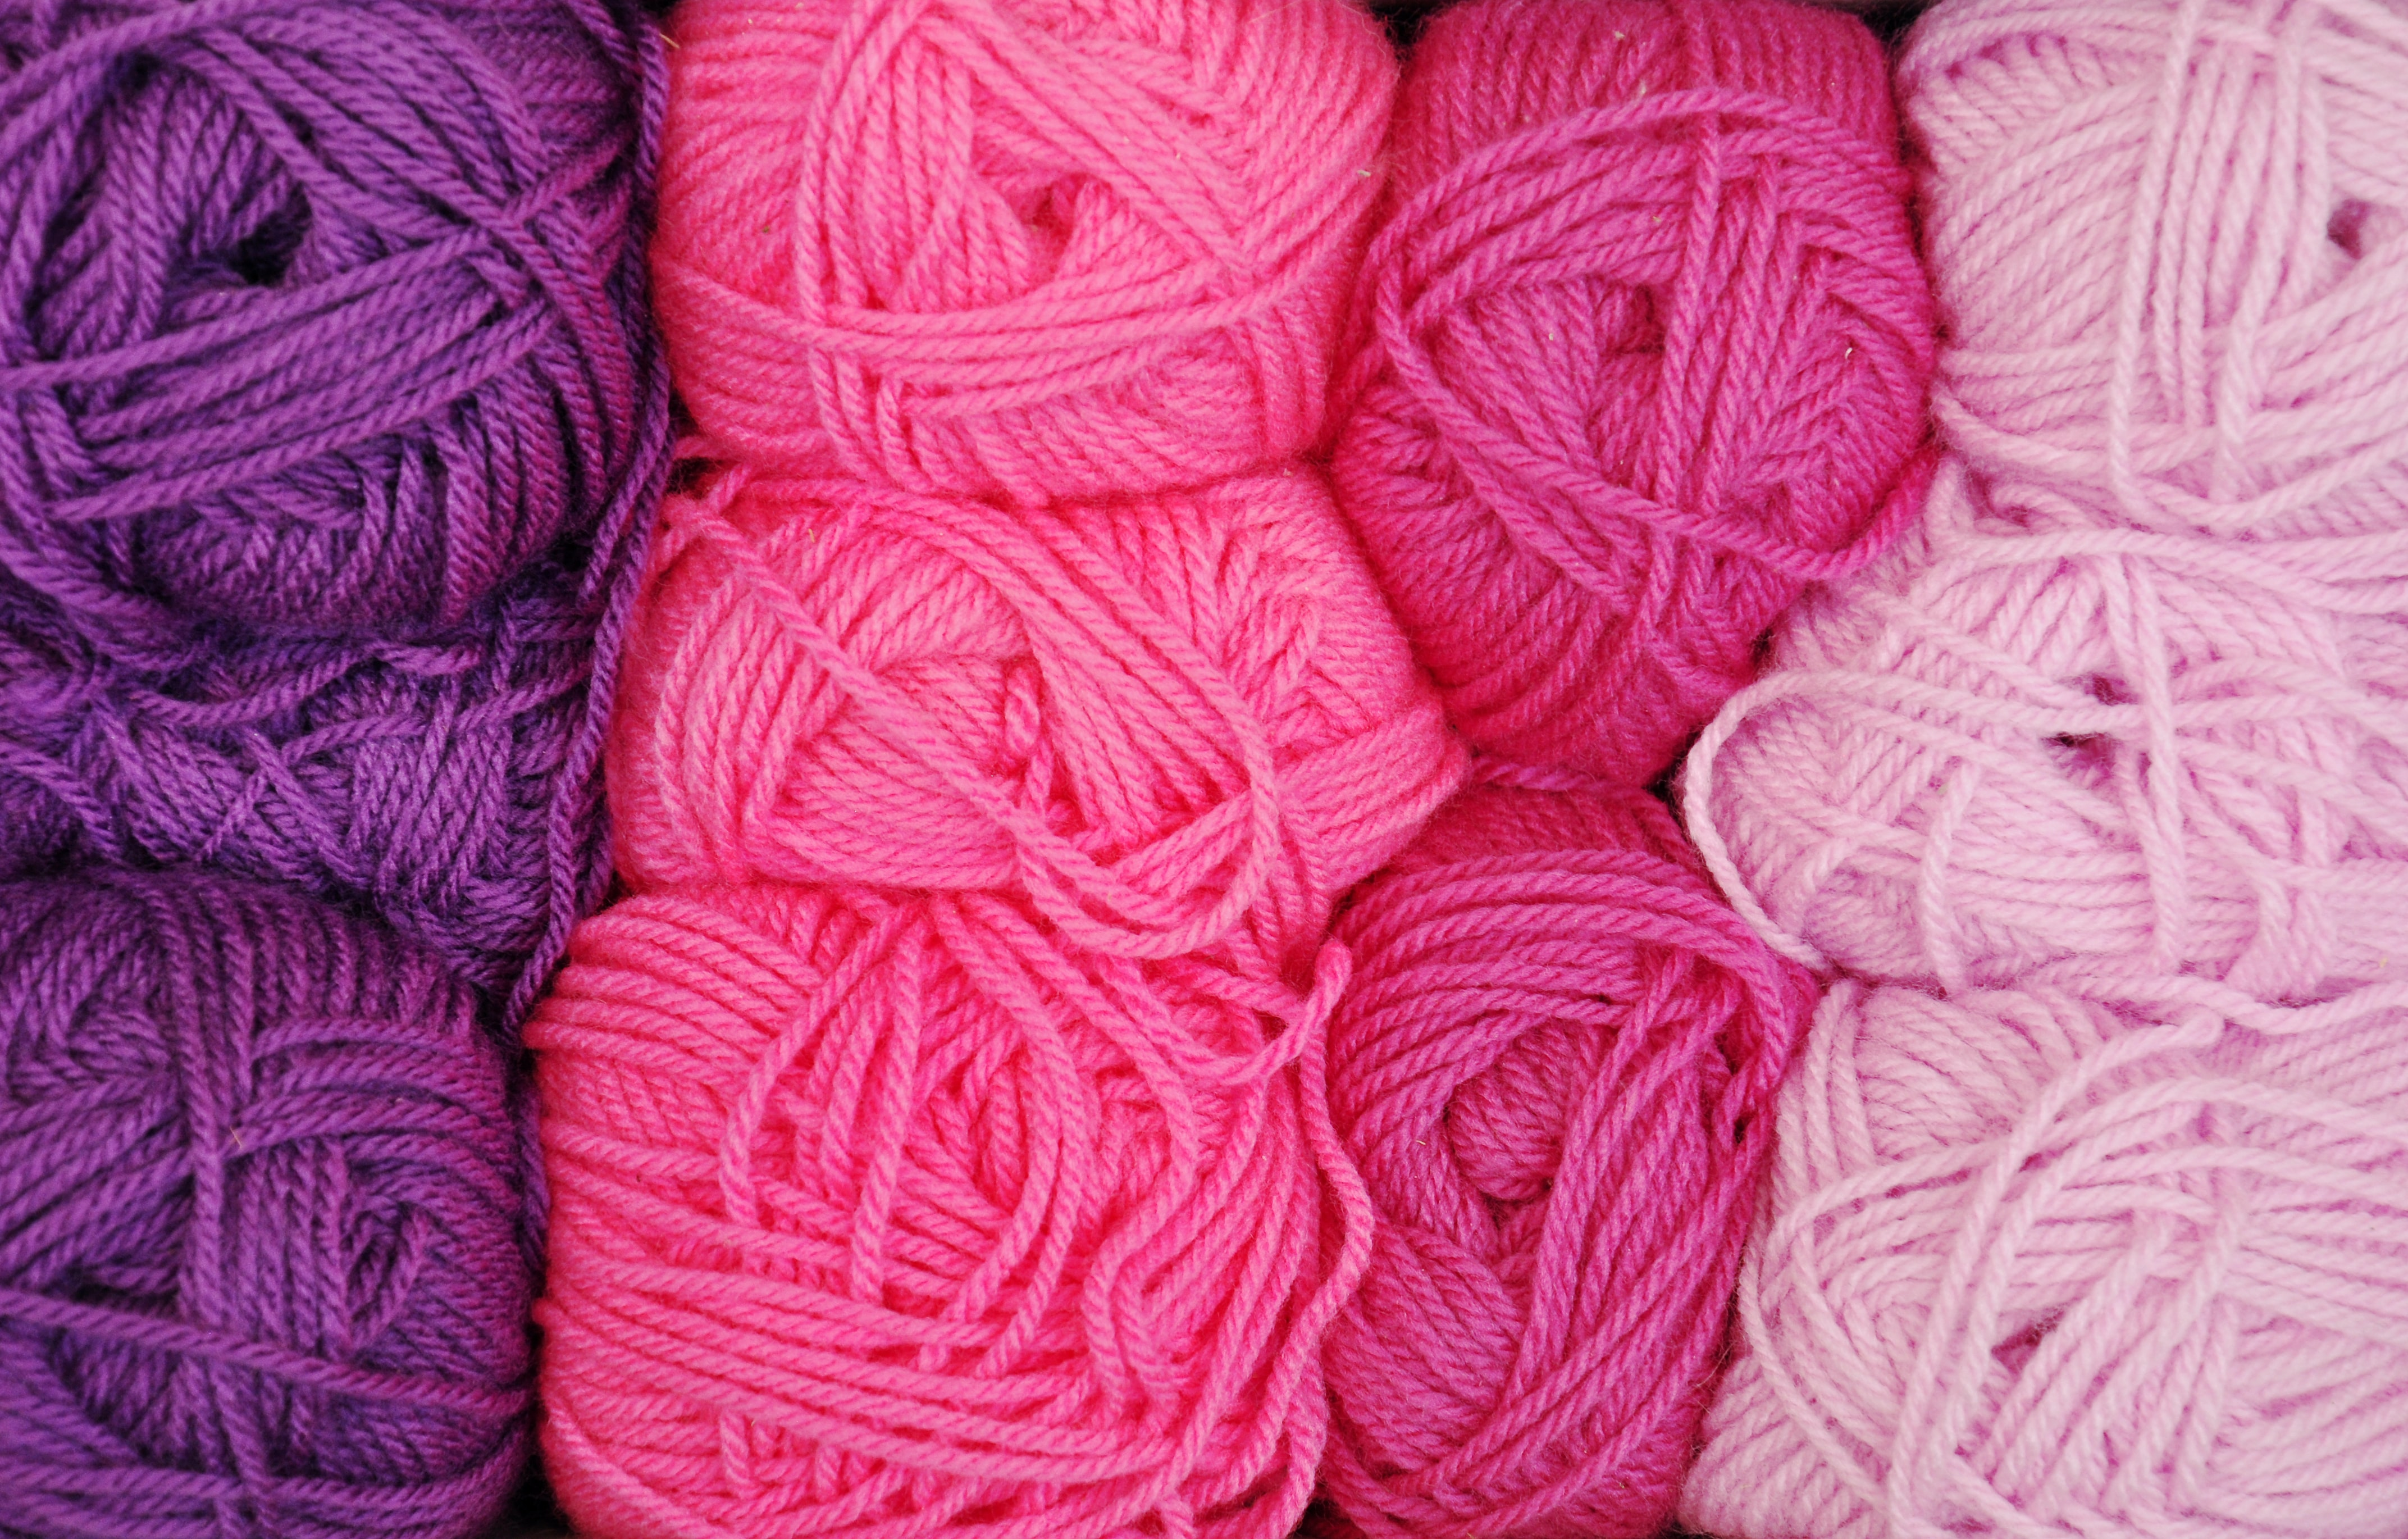 stocked yarns